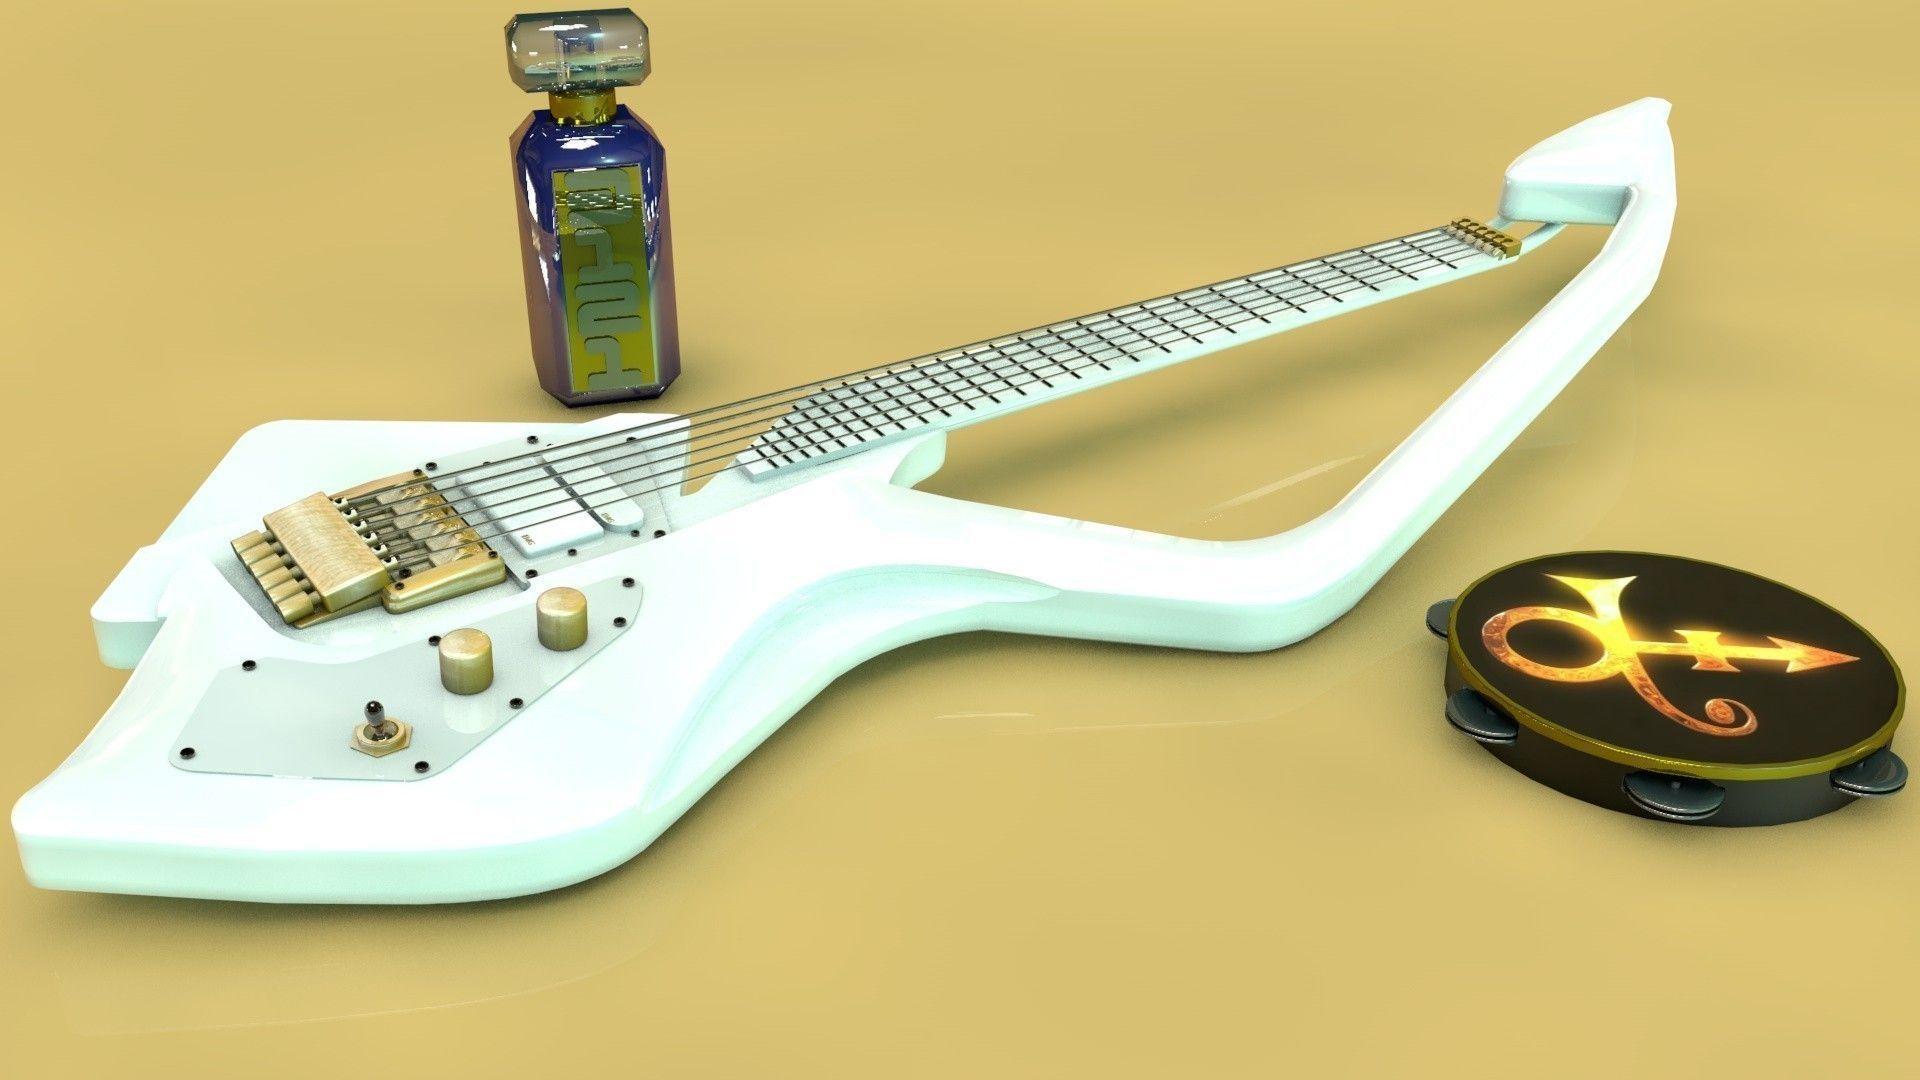 Prince c model guitar 3d cgtrader prince c model guitar 3d model obj 3ds c4d dxf 4 buycottarizona